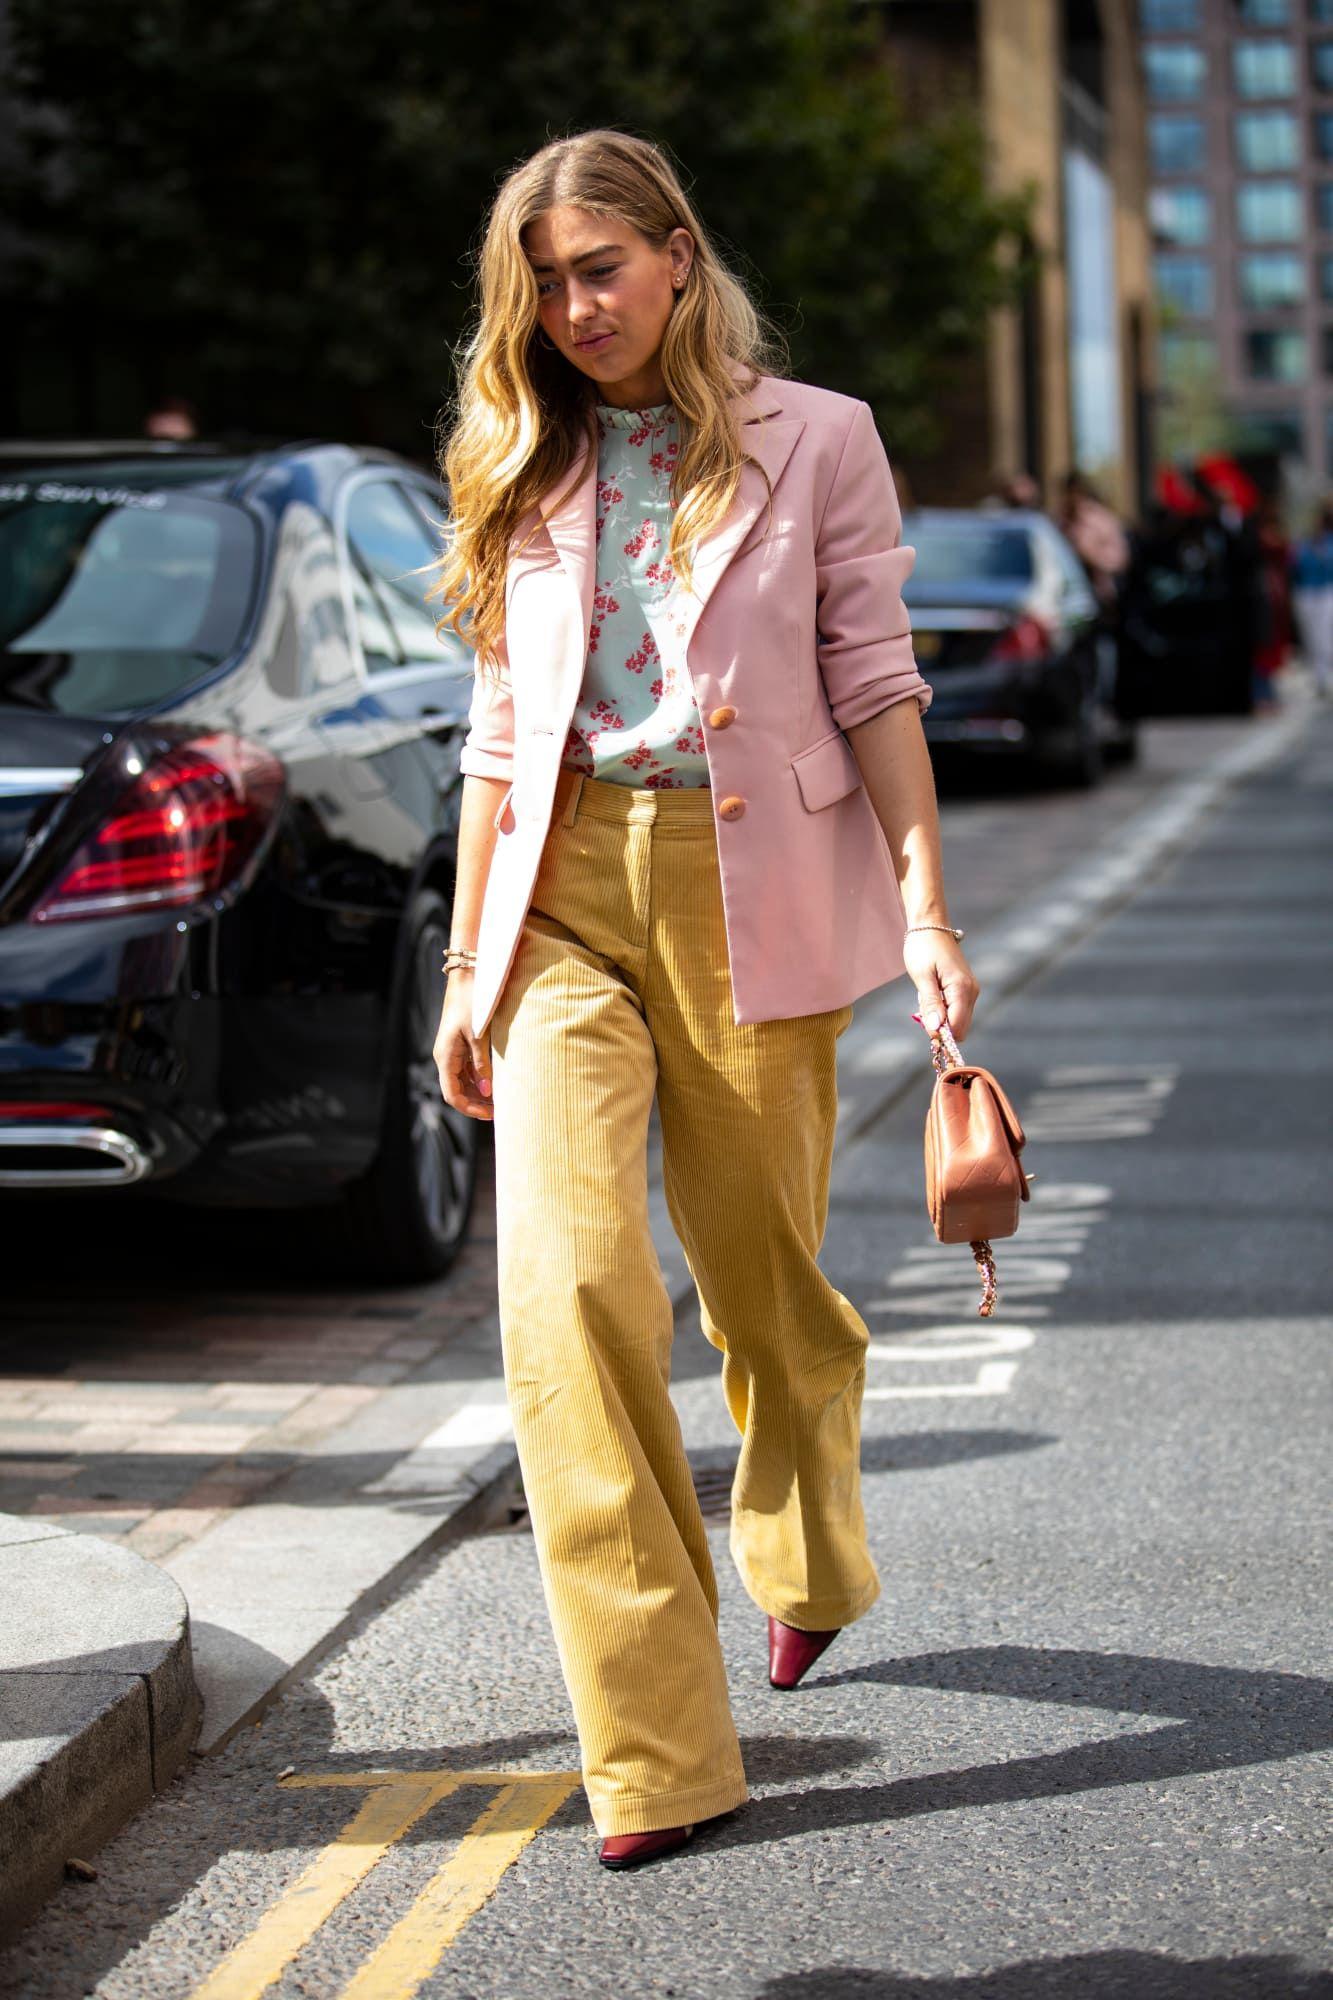 The Best Street Style Looks From London Fashion Week